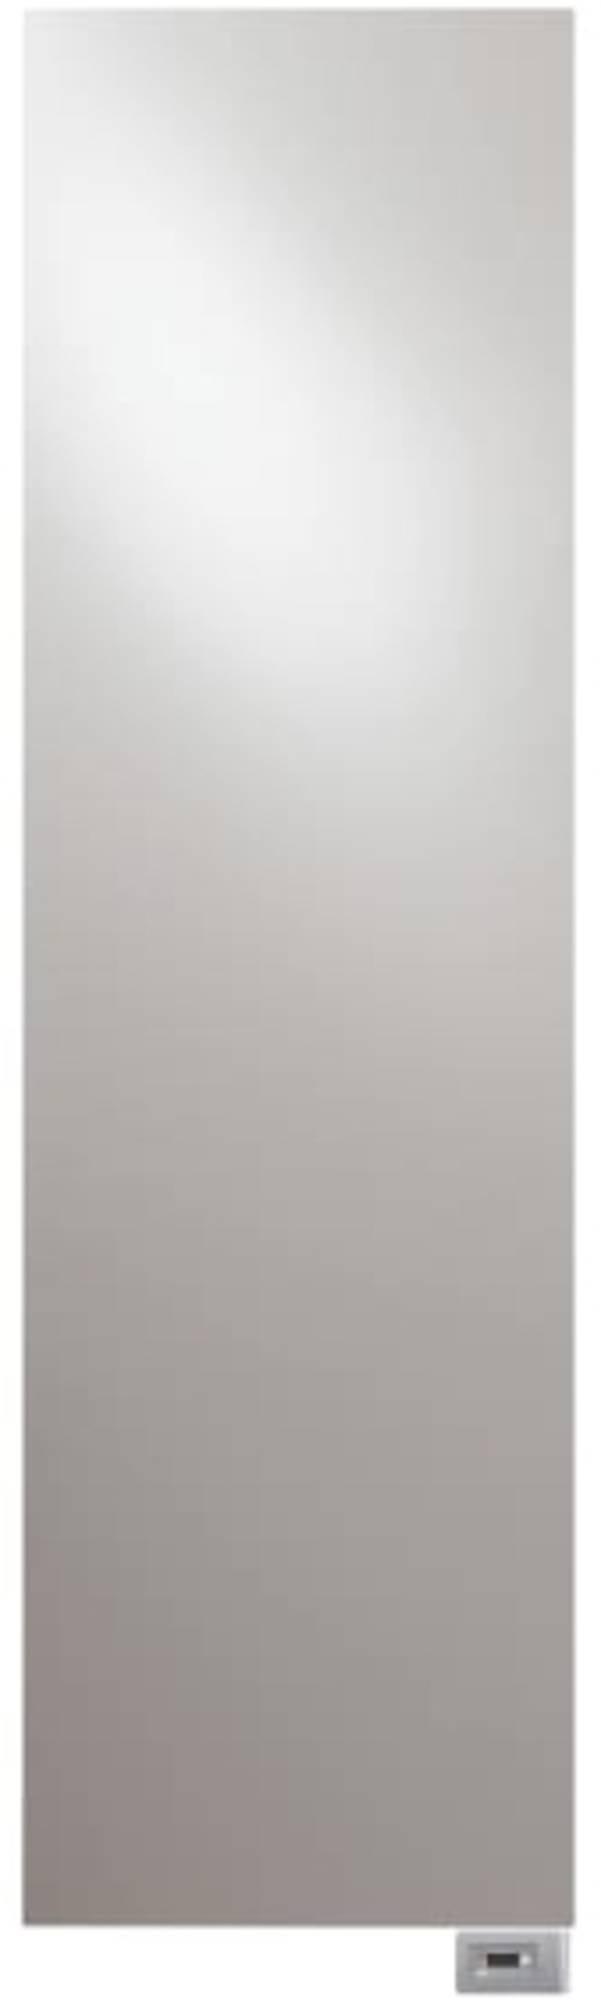 Elektrische Radiator Vasco Niva N1L1-EL 520x1105mm 750Watt Glanzend Wit